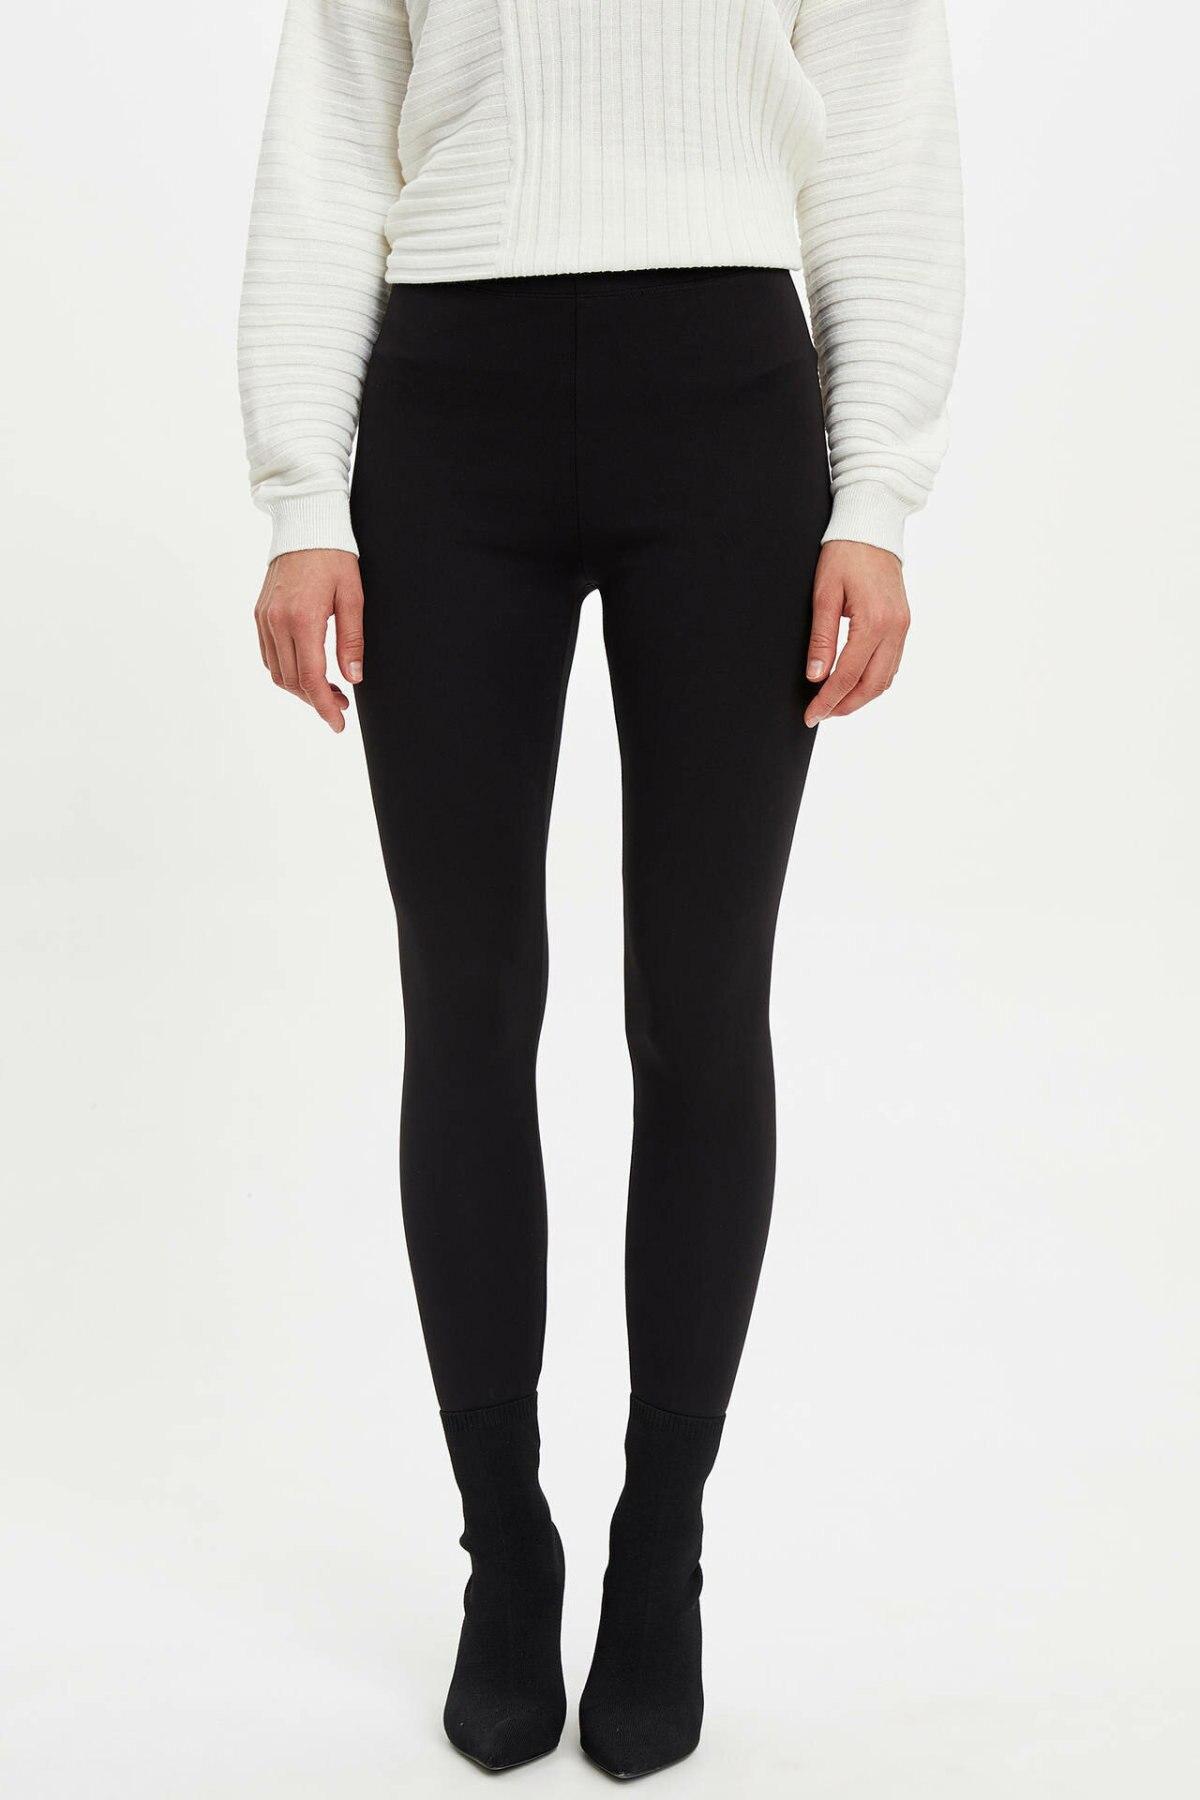 DeFacto Women Fashion High Waist Casual Women's Skinny Trousers Ladies Solid Sport Leggings Leisure Pants - M4561AZ19WN